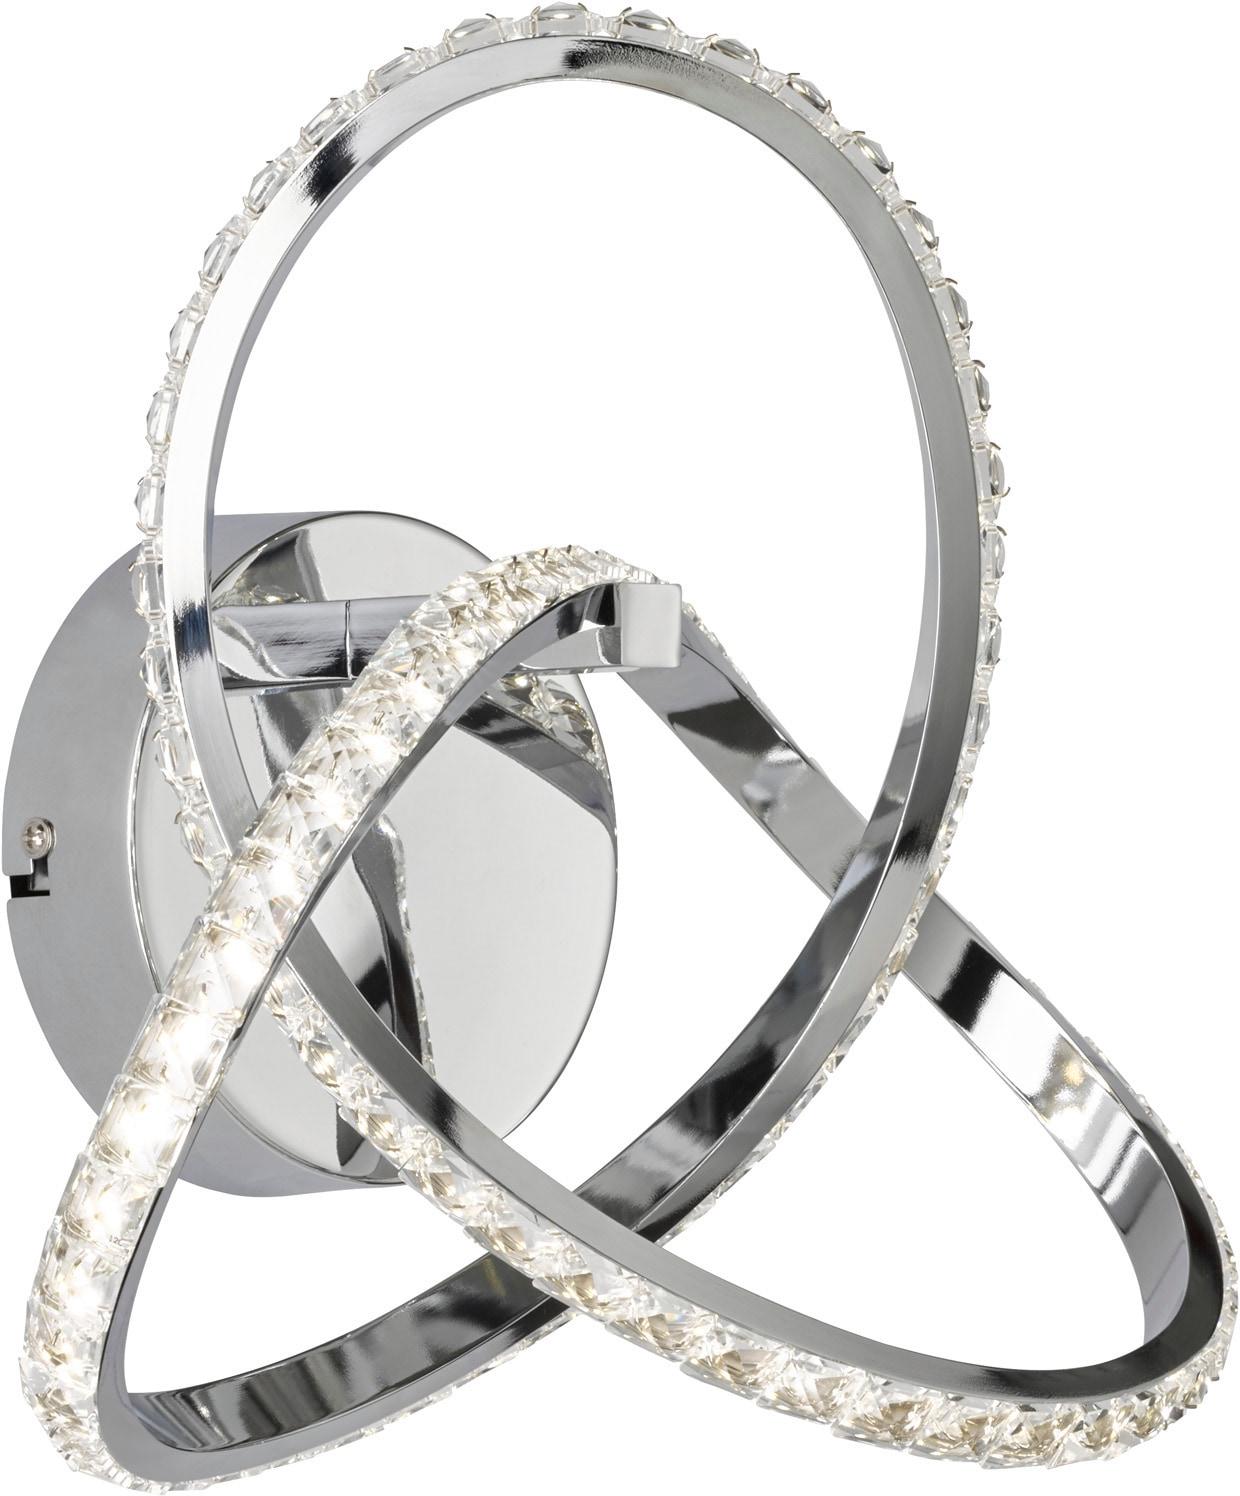 WOFI Wandleuchte ABRO, LED-Modul